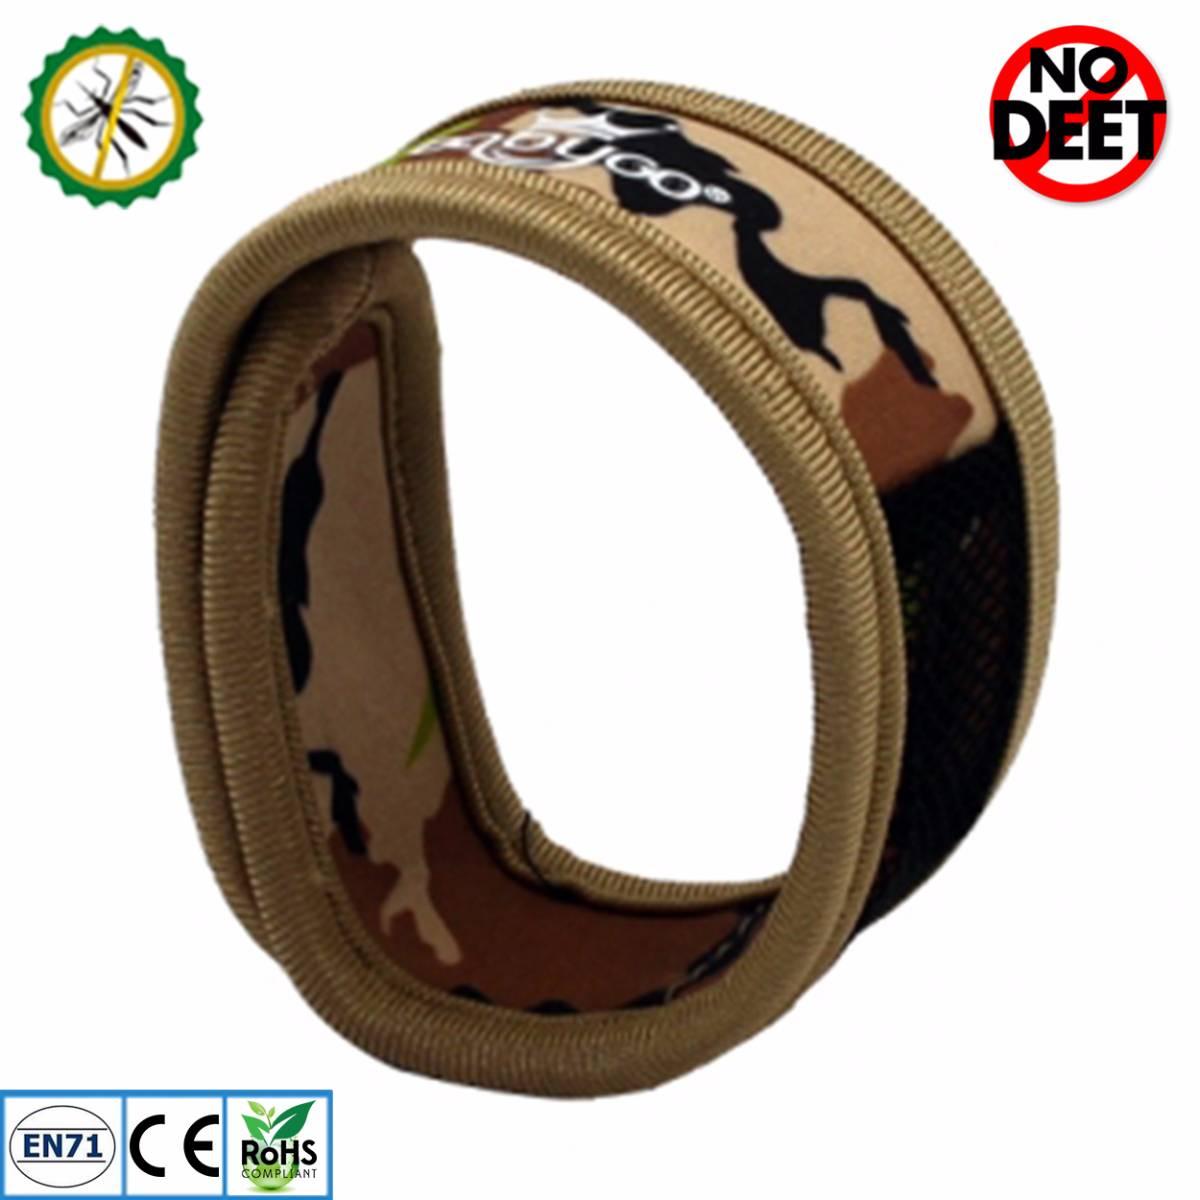 Babygo Neoprene Mosquito Repellent Wristband Camouflage (gelang Anti Nyamuk)